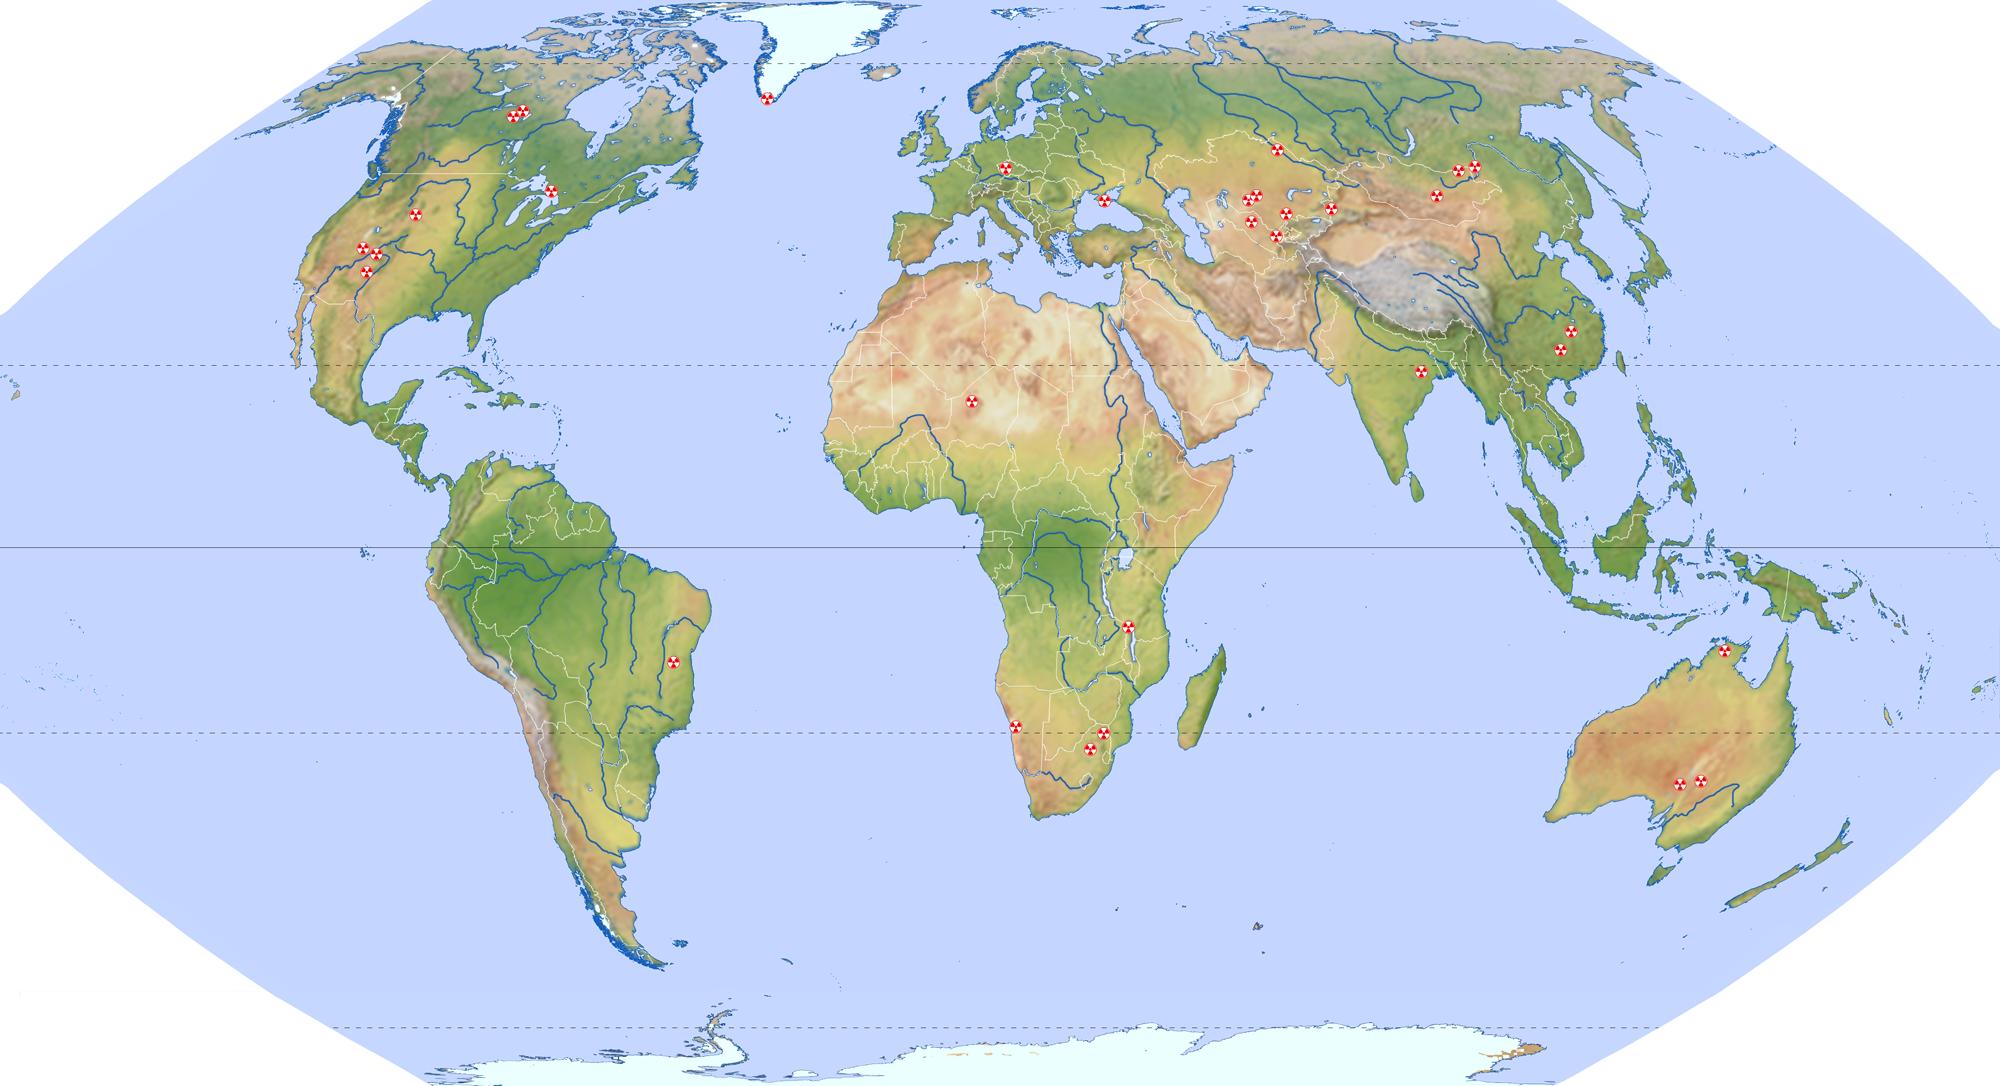 realistische weltkarte File:Weltkarte Uranförderung.png   Wikimedia Commons realistische weltkarte